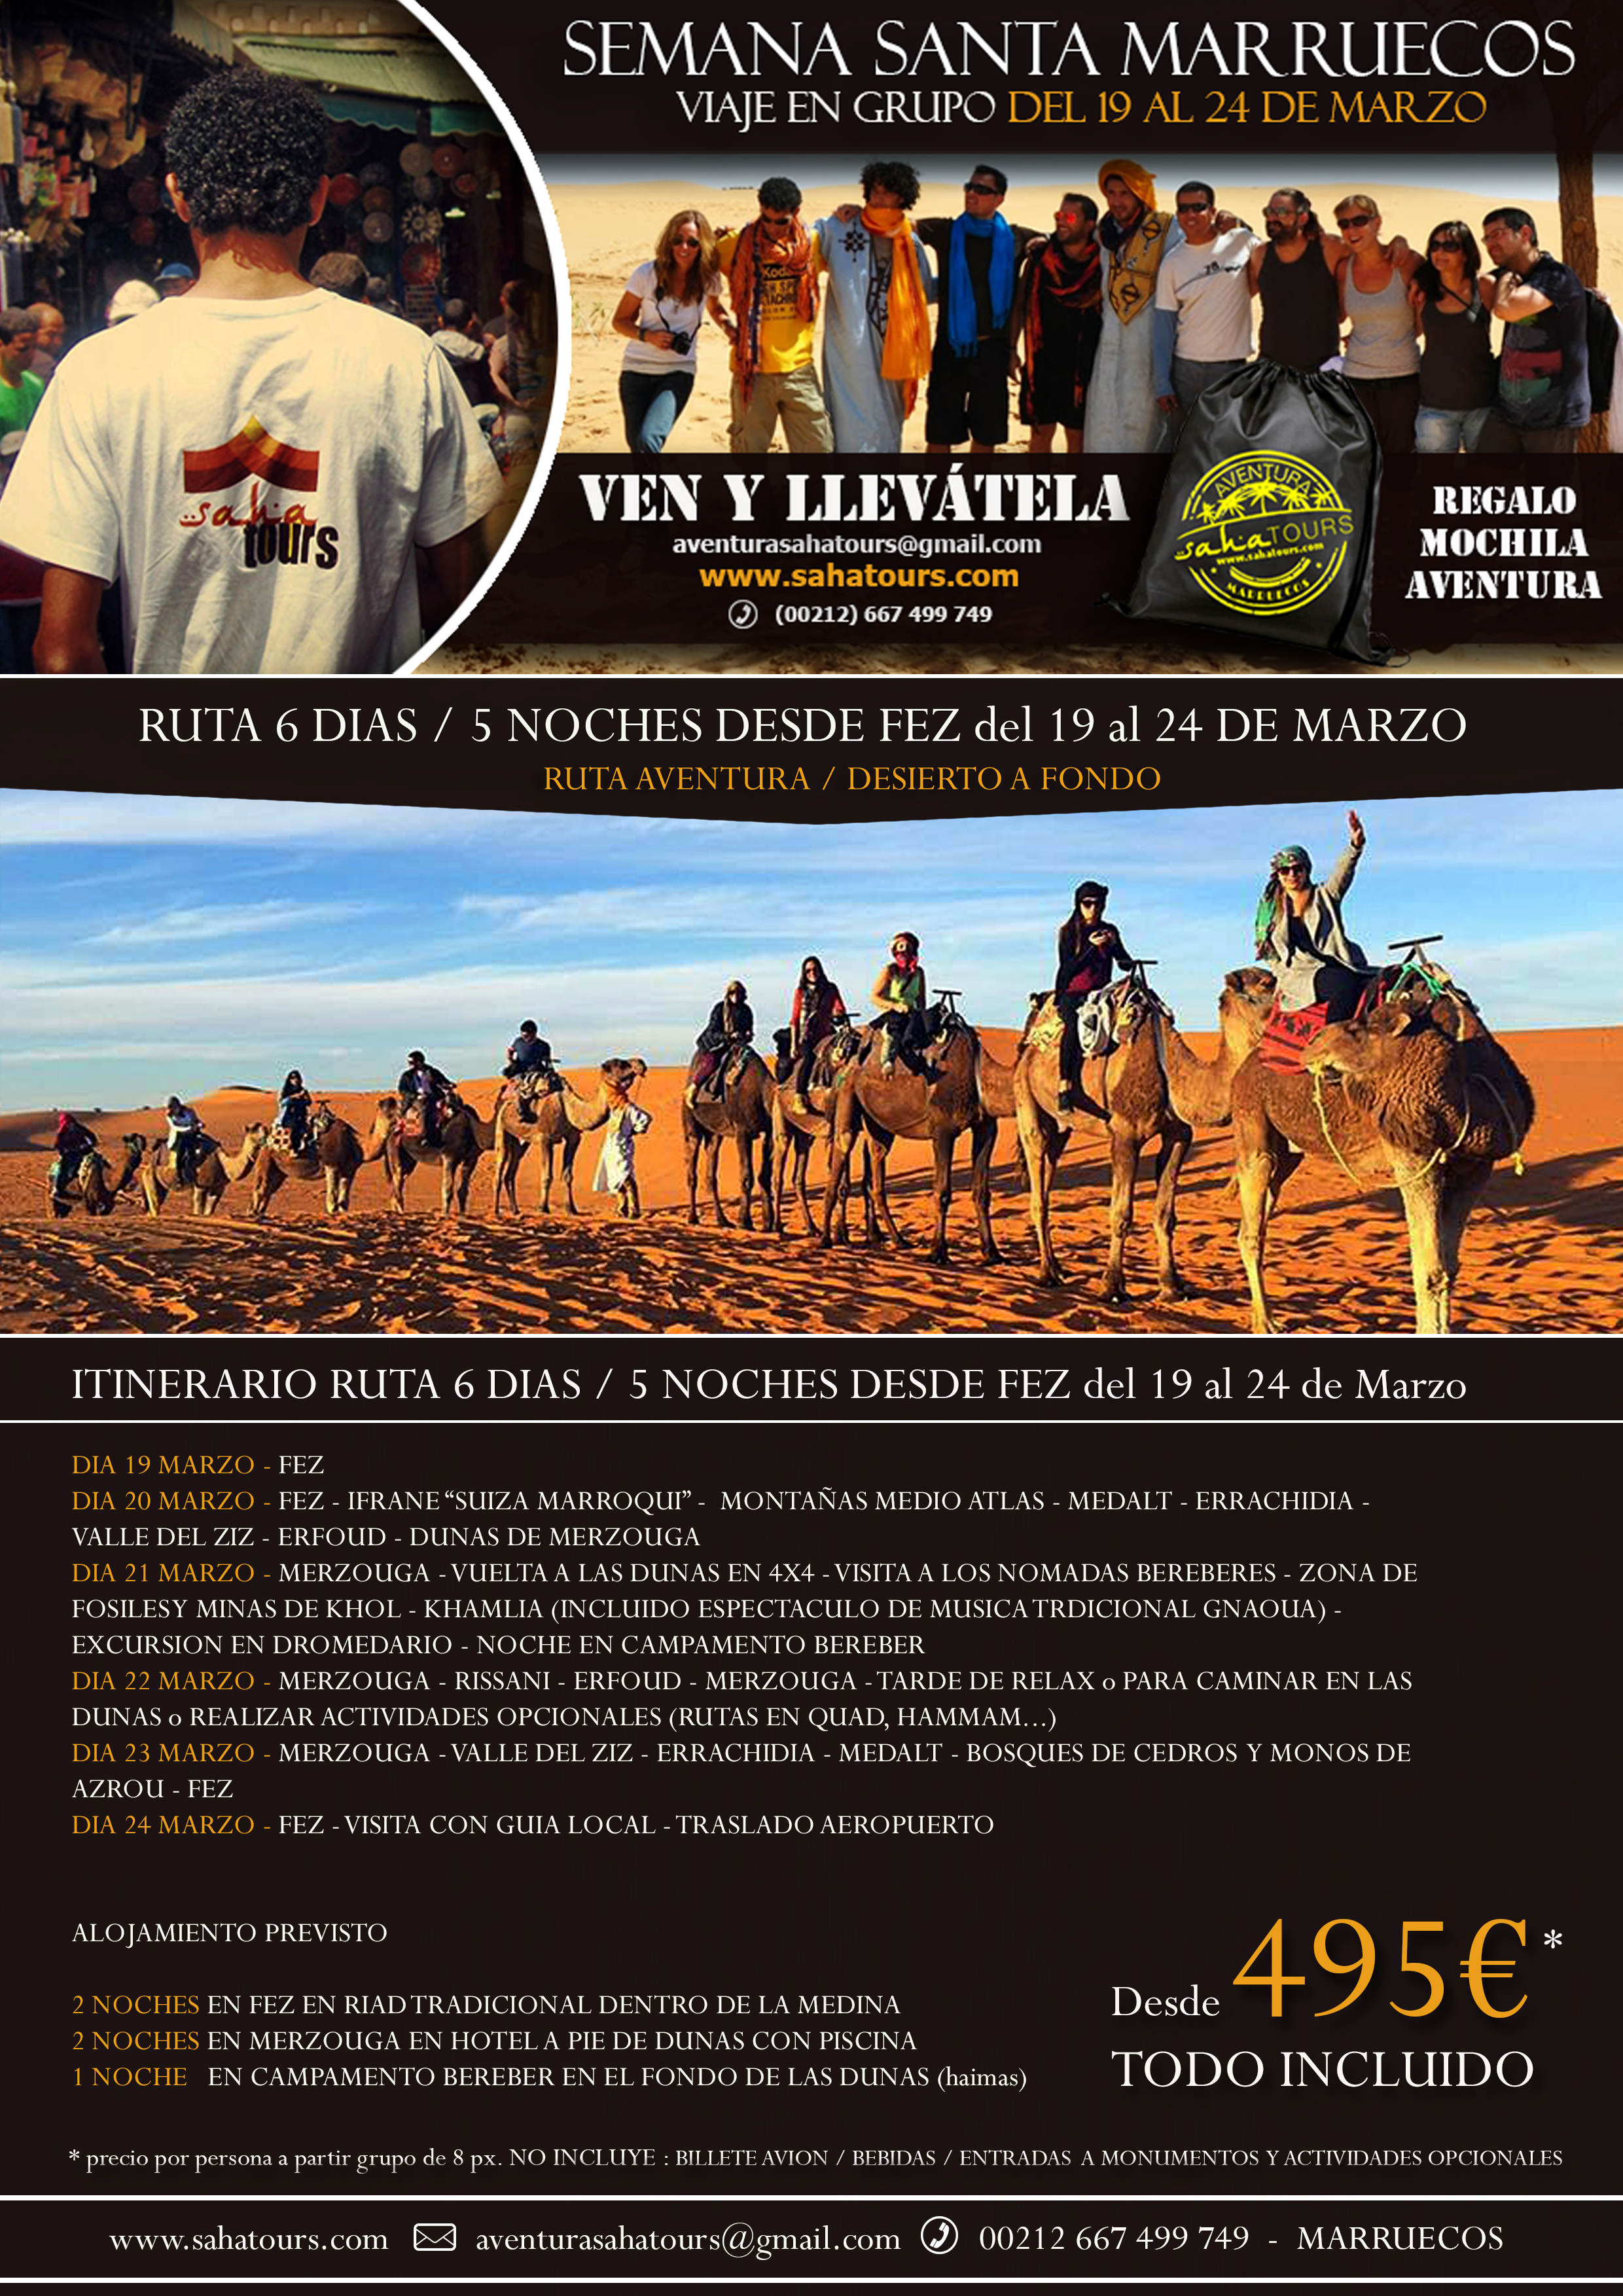 VIAJE A MARRUECOS EN GRUPO - SEMANA SANTA 2016 1